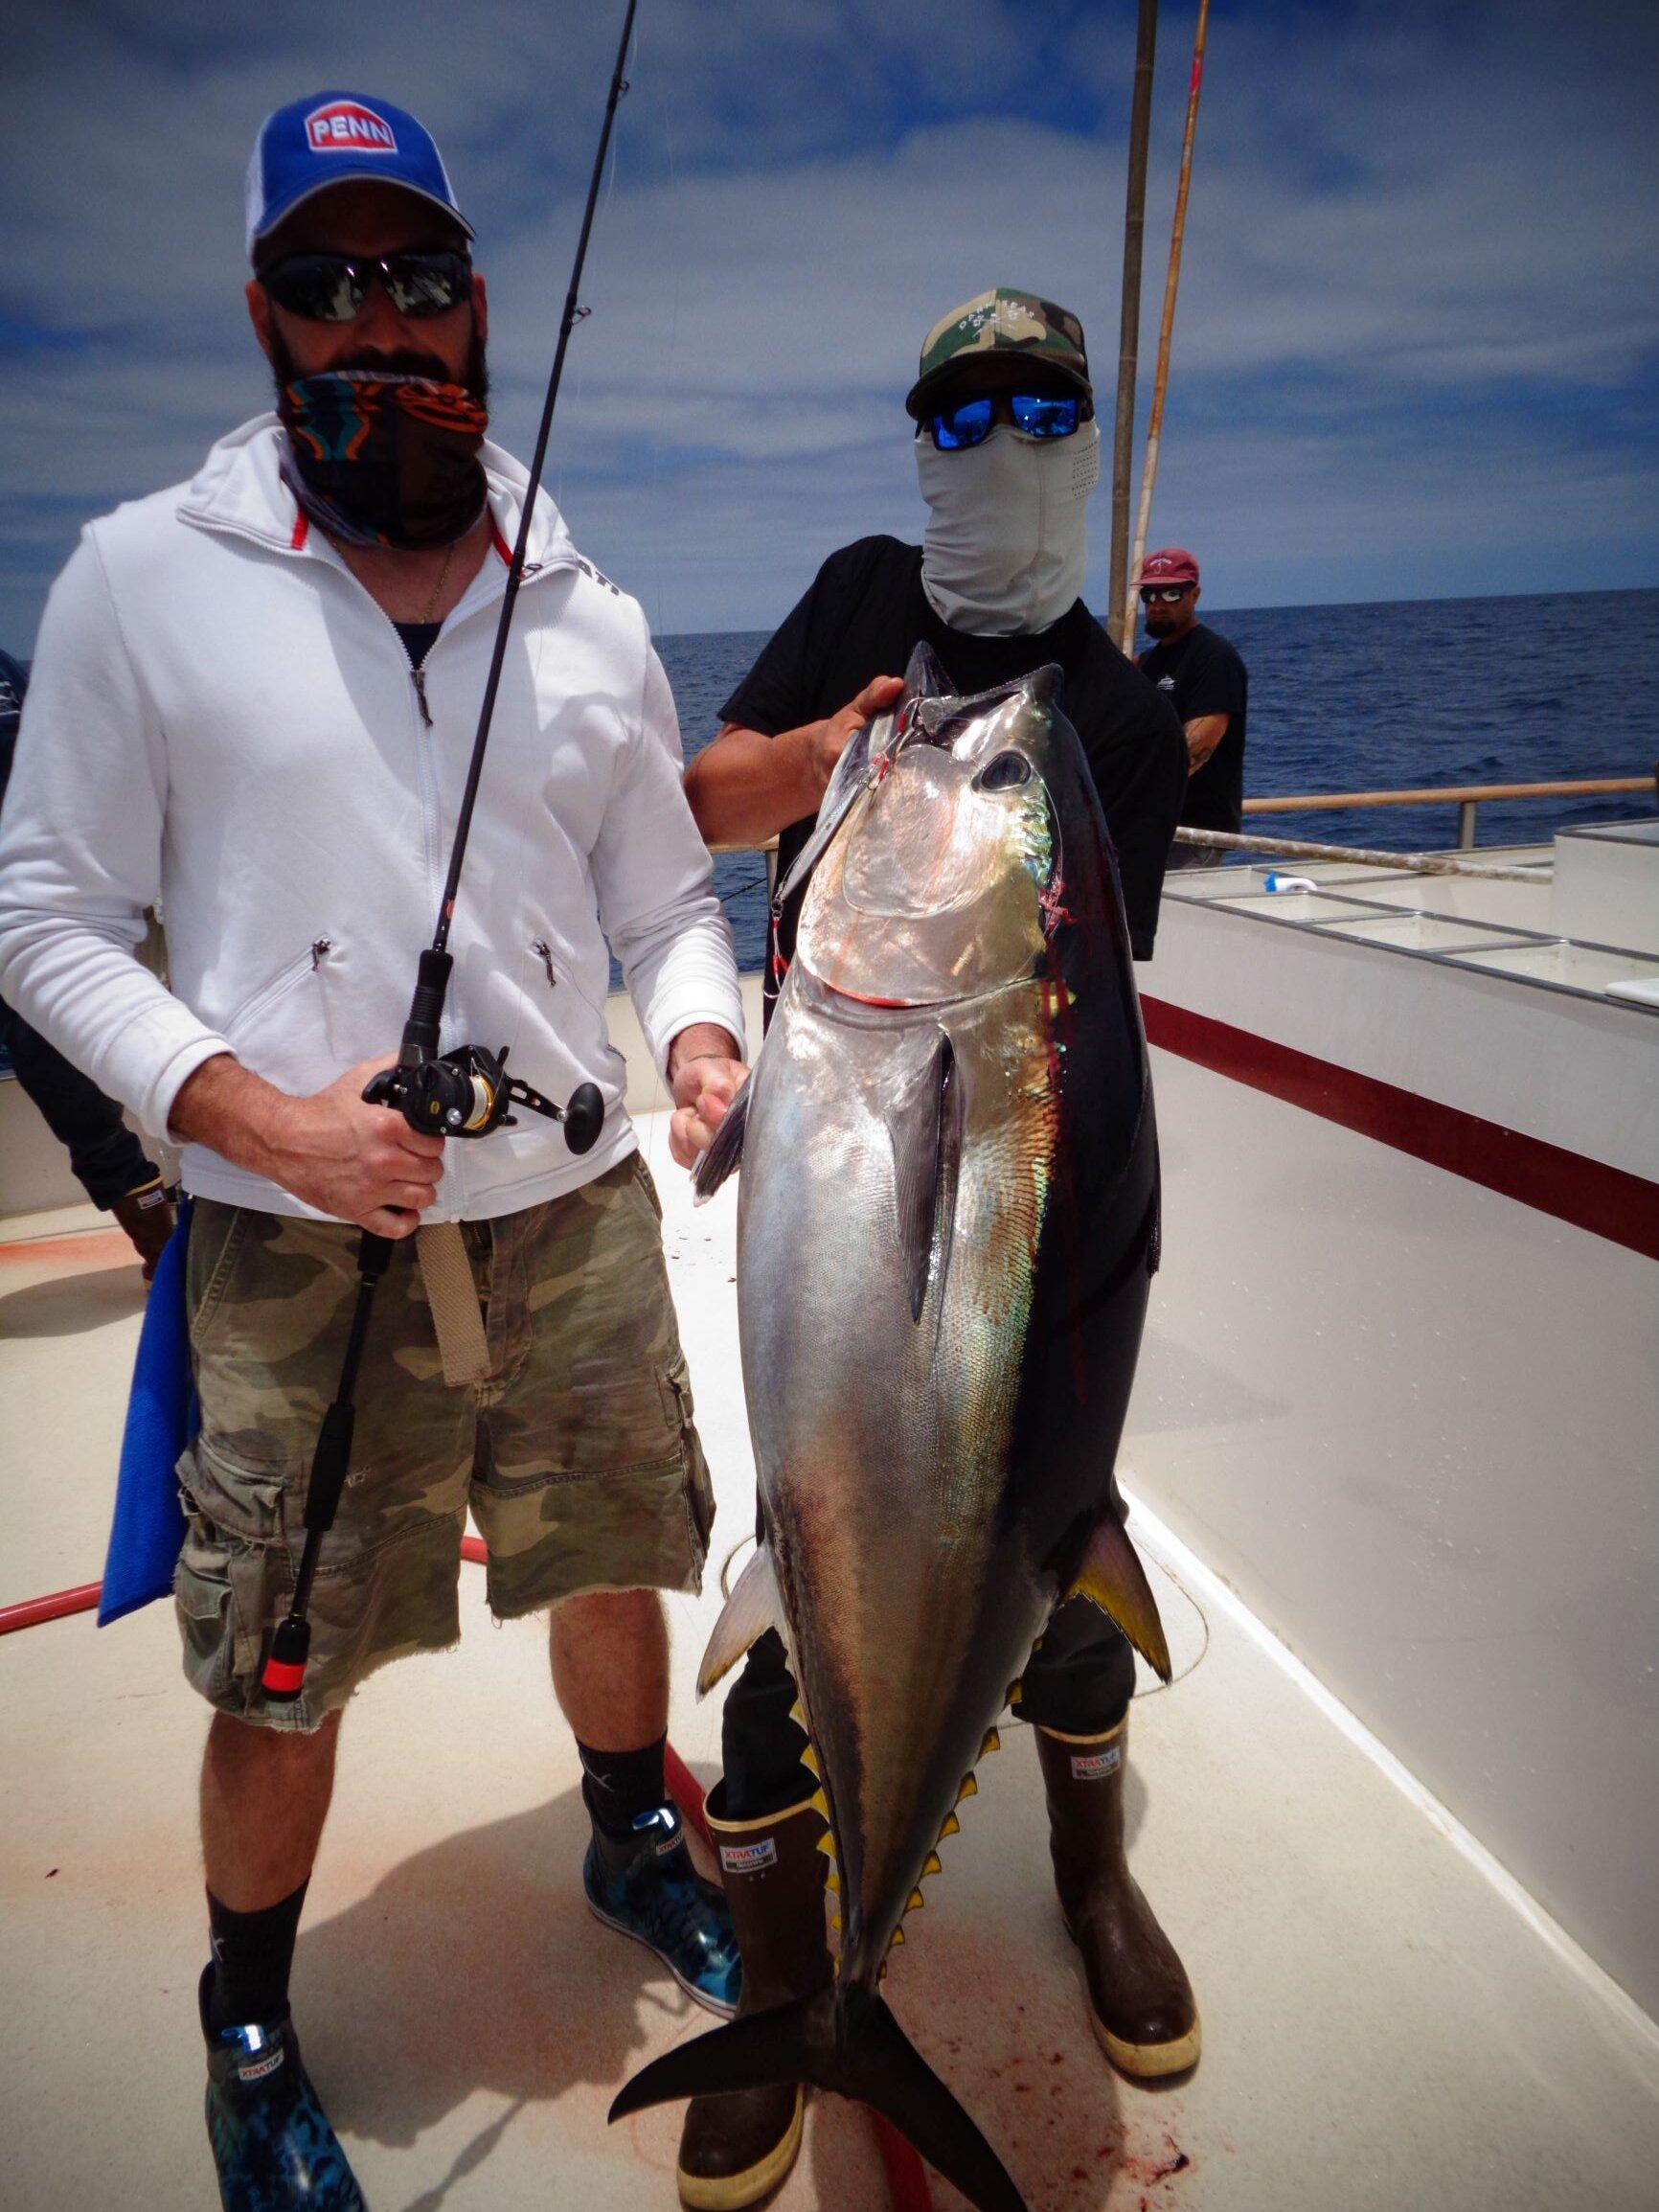 Bluefin slow pitch 1 RESIZED.JPG